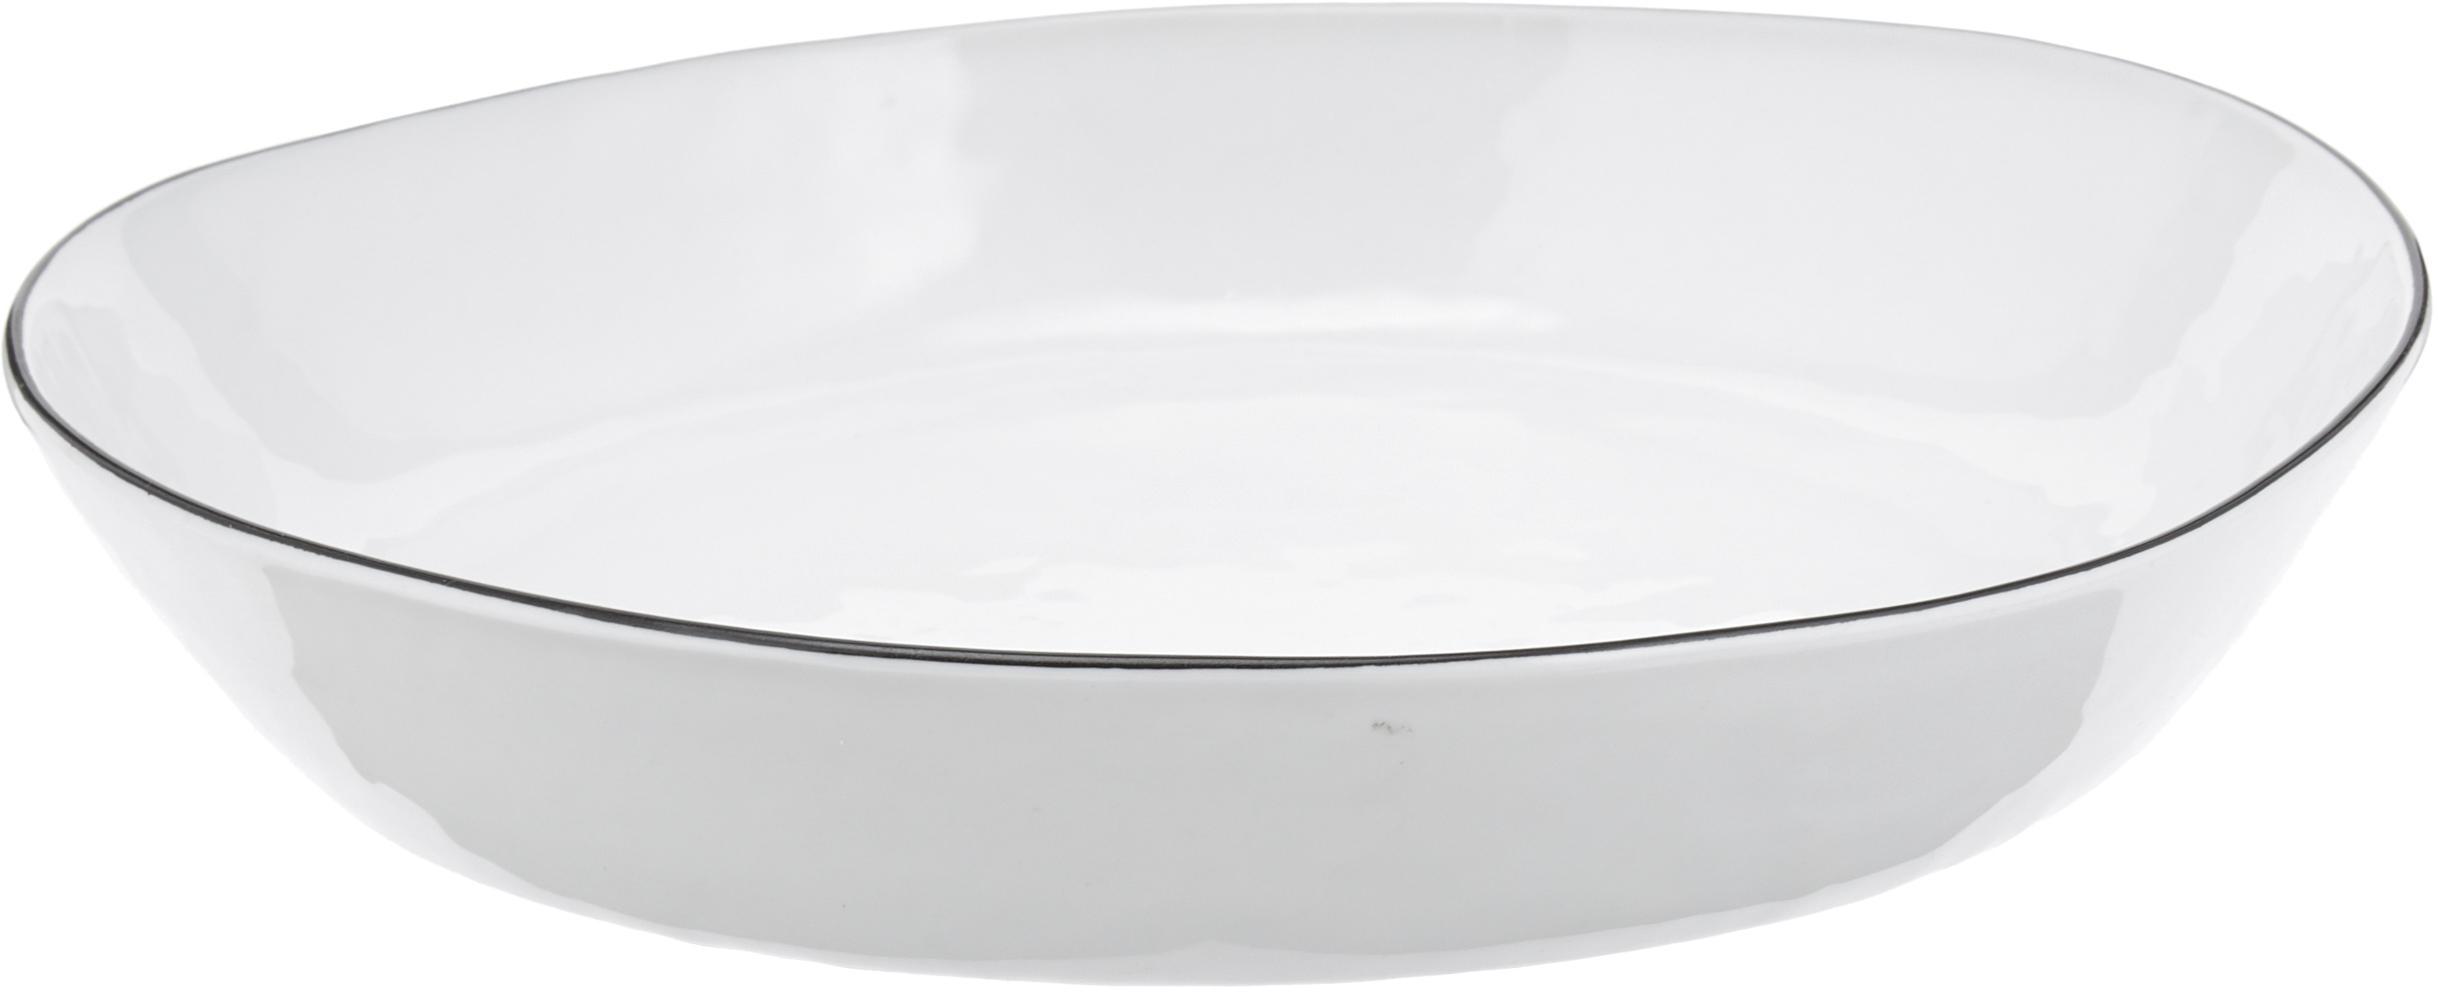 Bol artesanal Salt, Porcelana, Blanco crudo, negro, An 24 x Al 4 cm